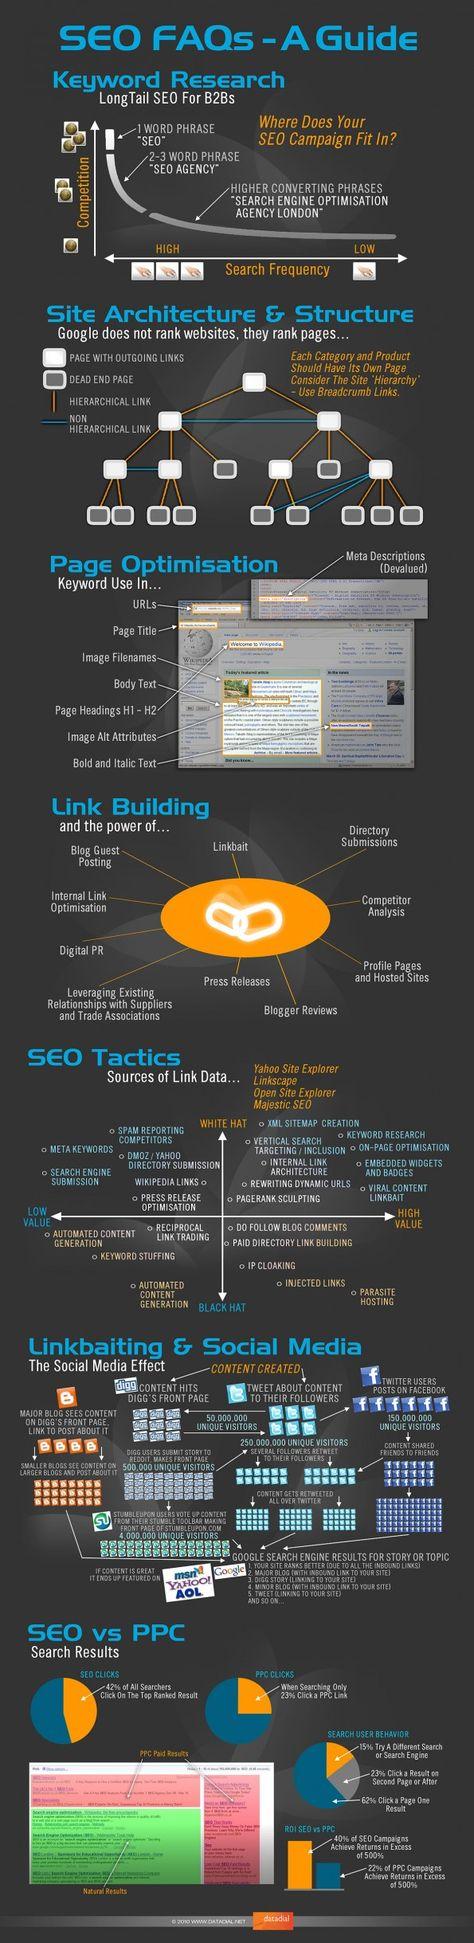 SEO explained in One Single Image [infographic] - Startup Freak